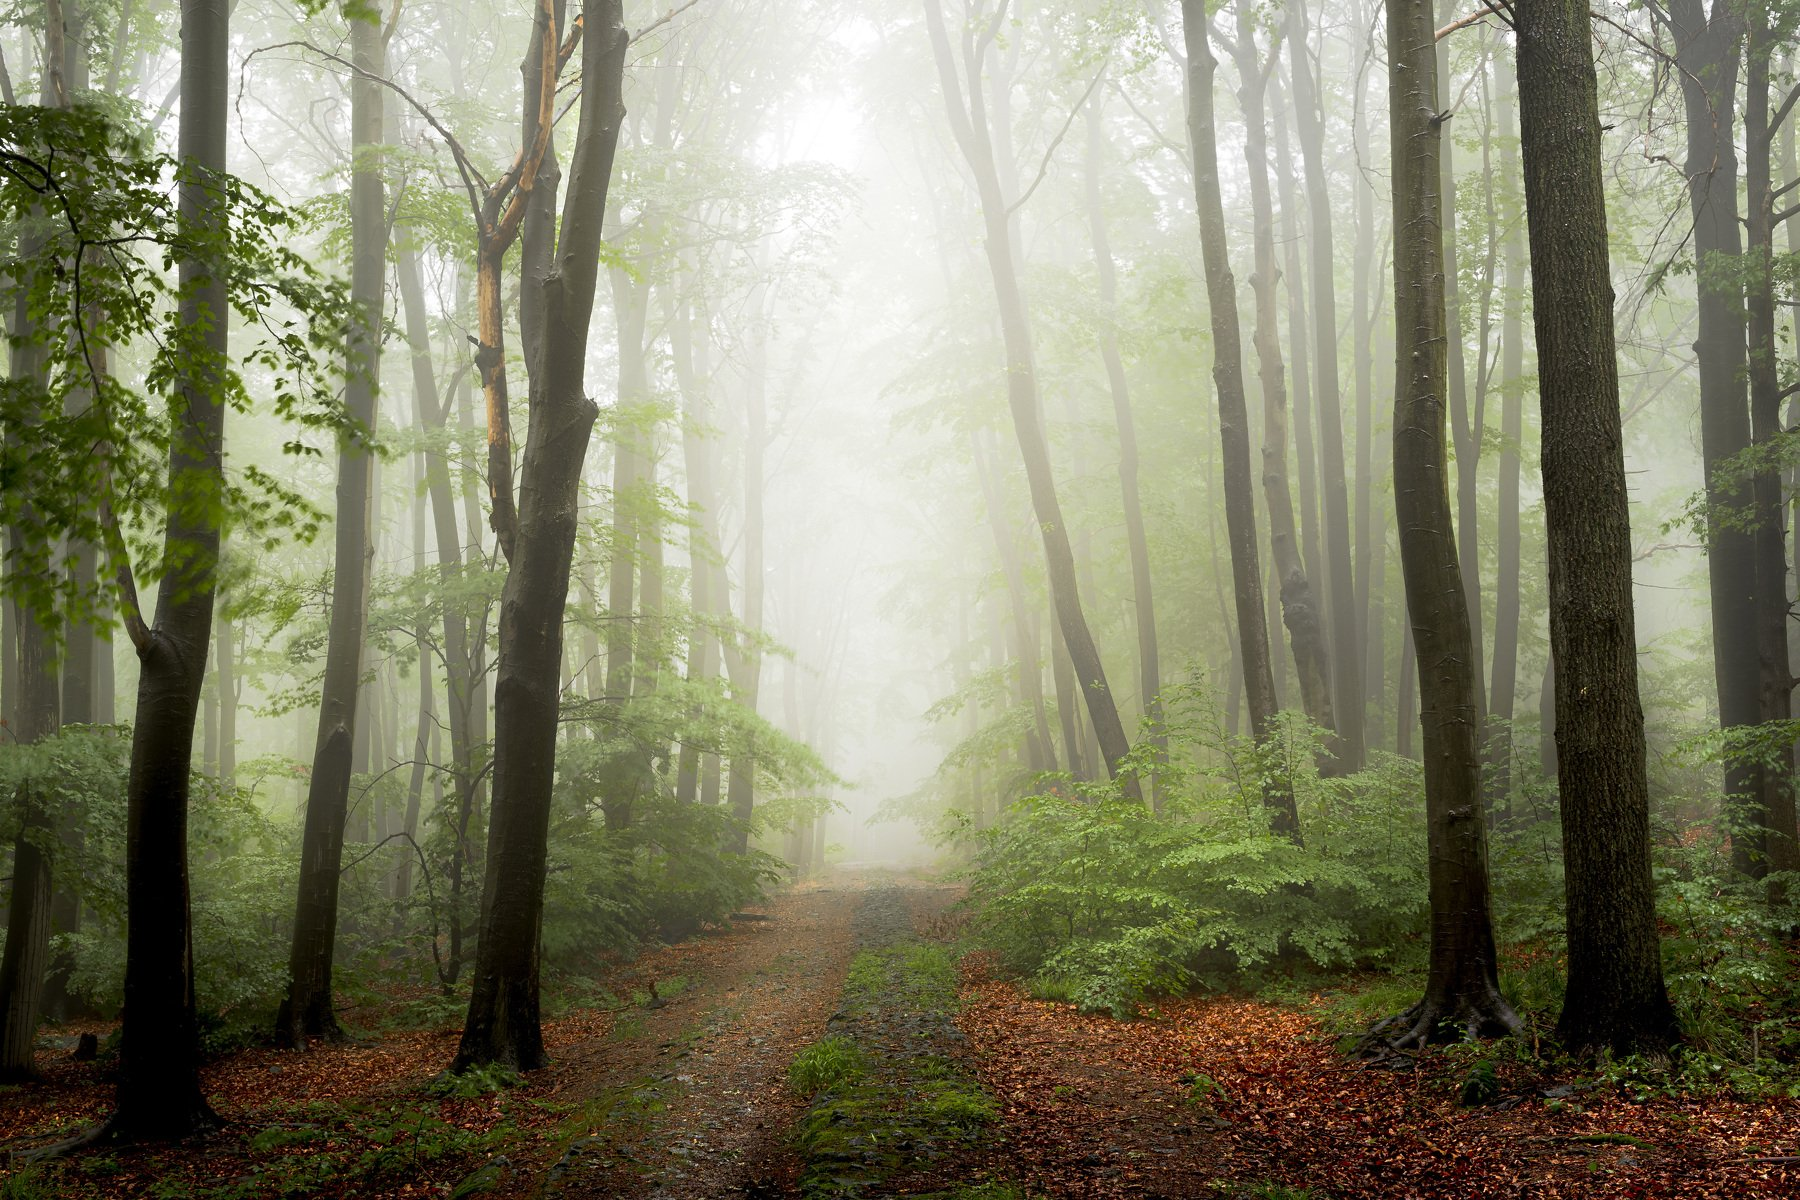 forest, fog, rain, spring, forest landscape, trees, road, mystical, mysterious, Myśliński Tomasz